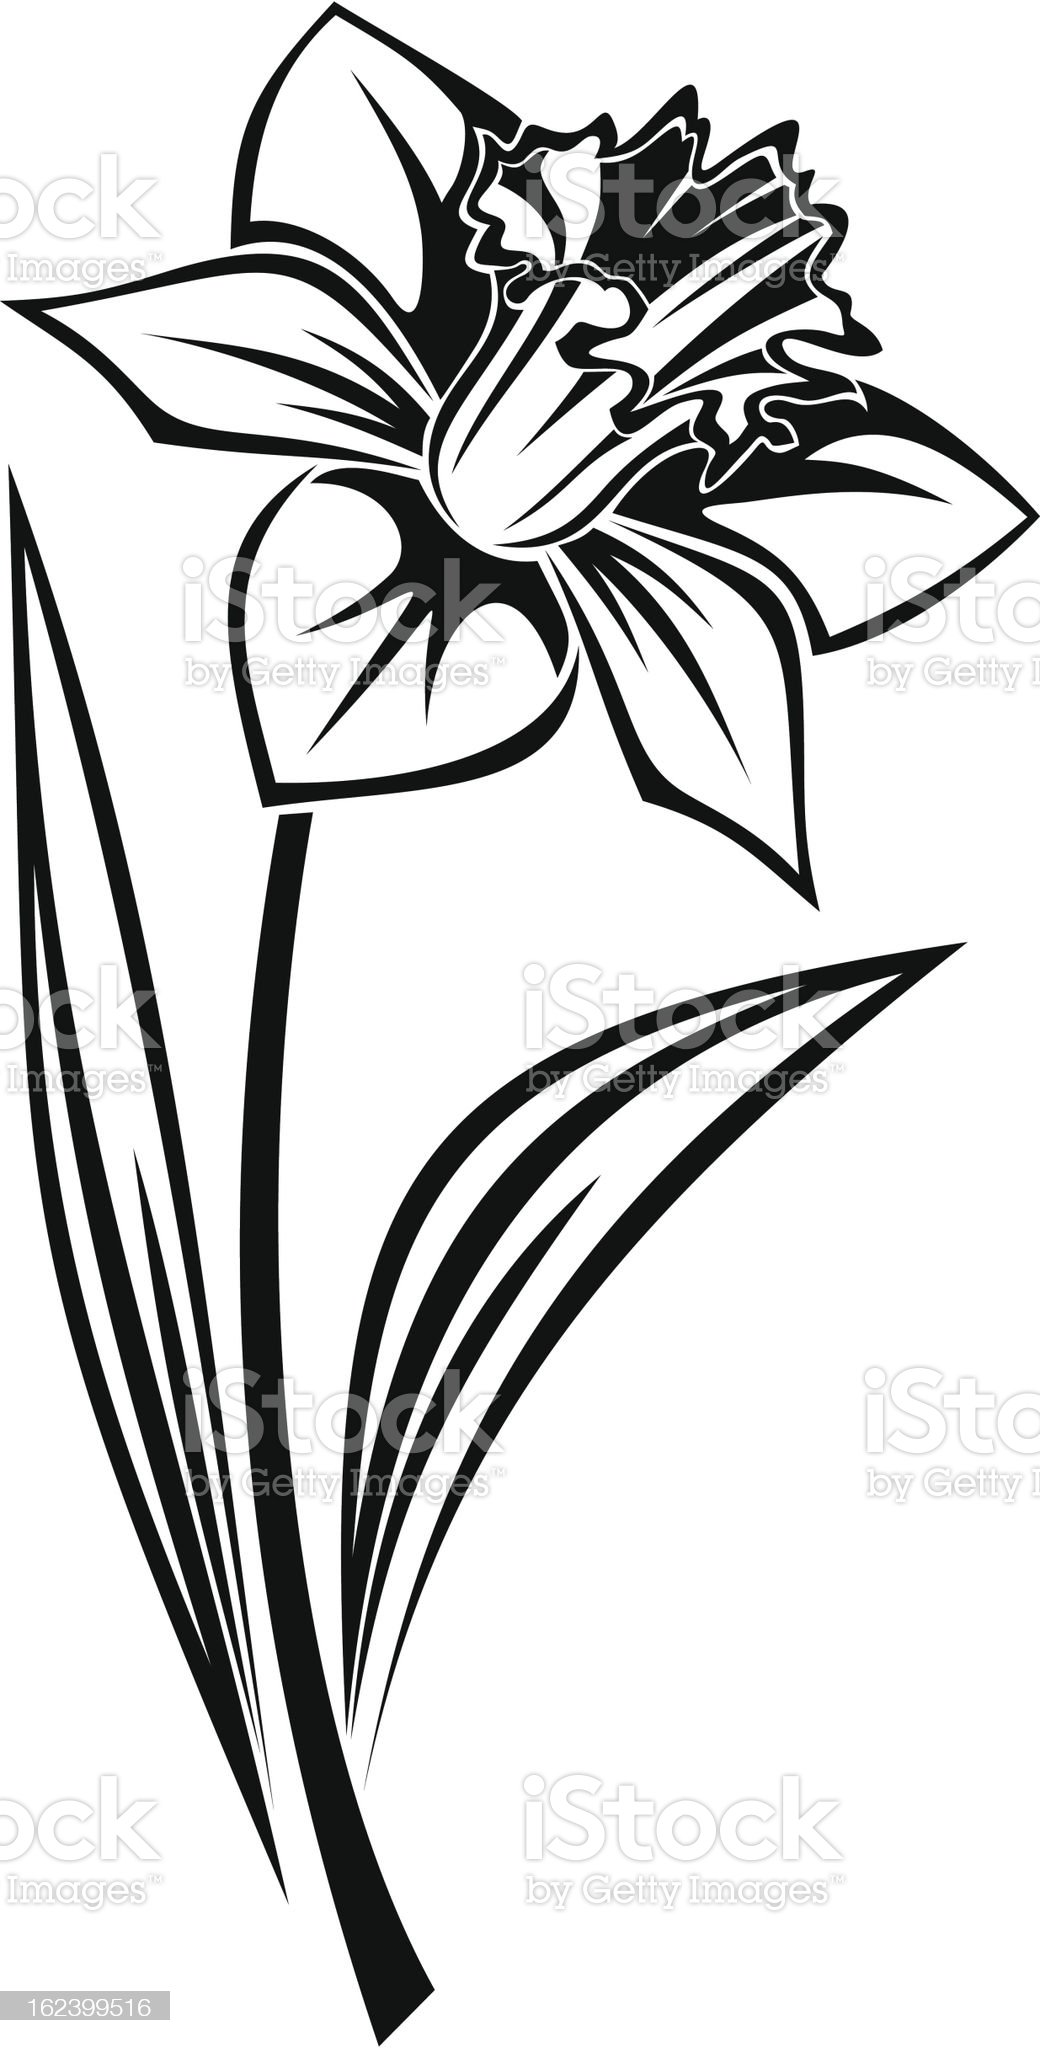 Black silhouette of narcissus flower. Vector illustration. royalty-free stock vector art